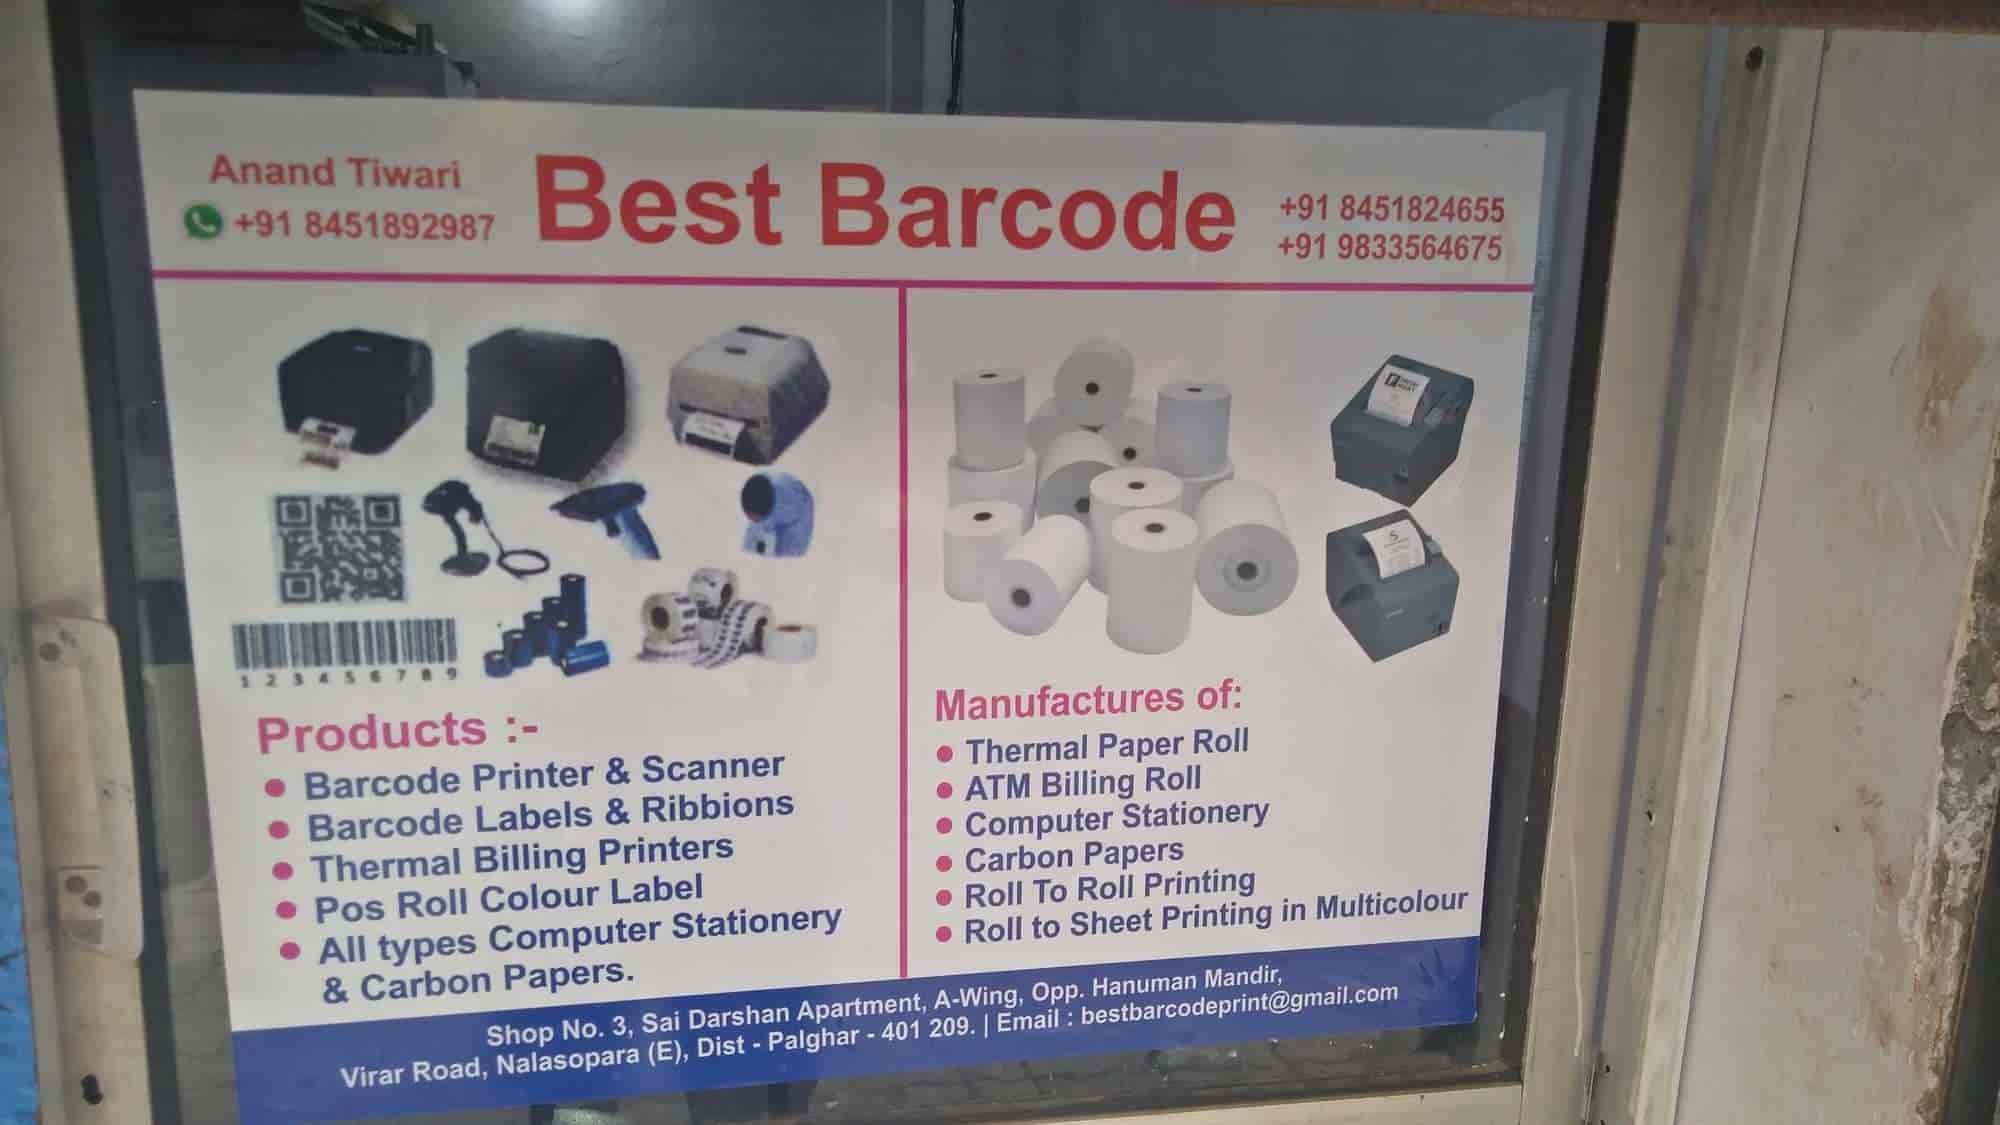 Best Barcode, Nalasopara East - Barcode Manufacturers in Palghar